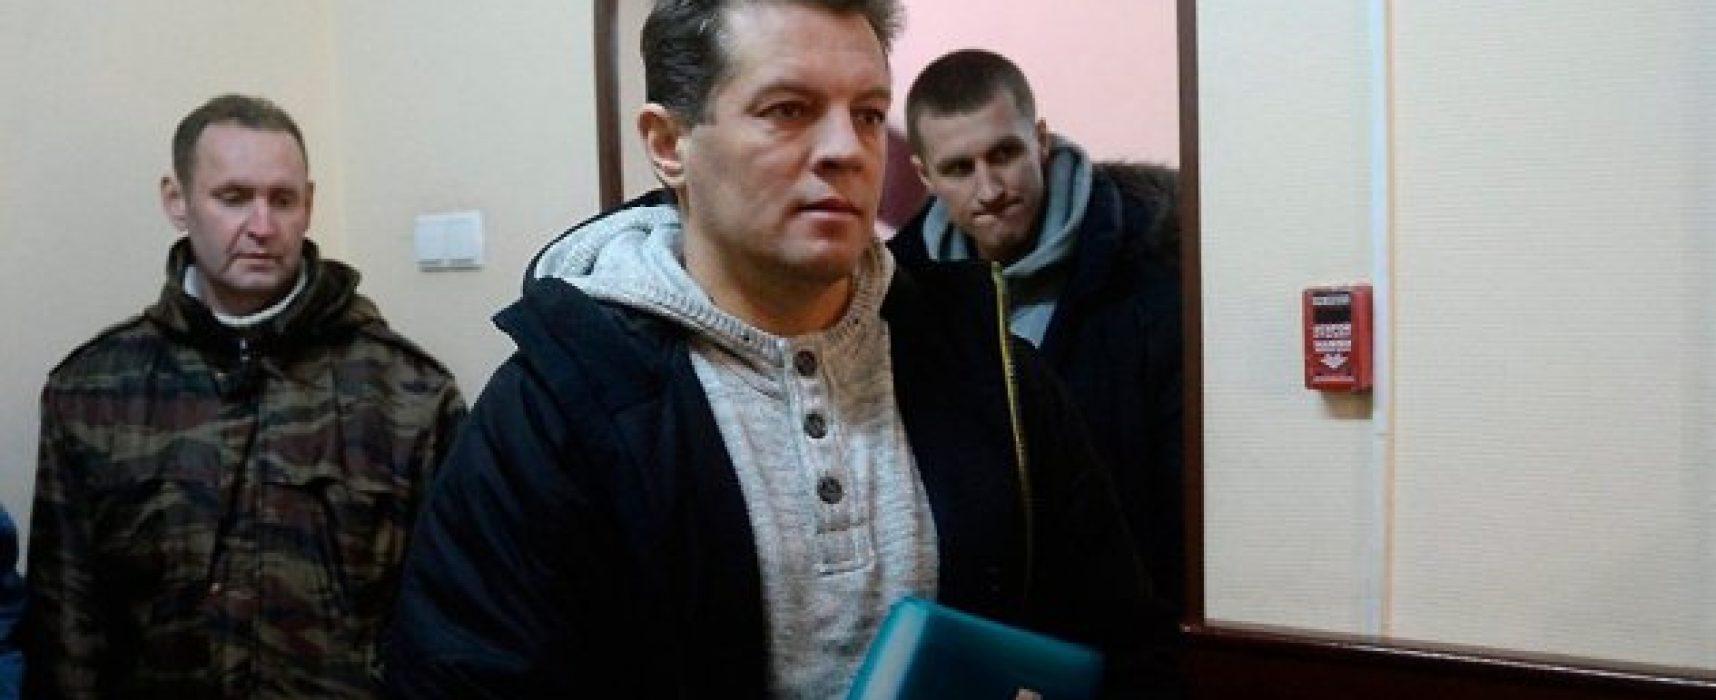 Ucrania exige ante la ONU que Rusia libere inmediatamente al periodista Súshchenko